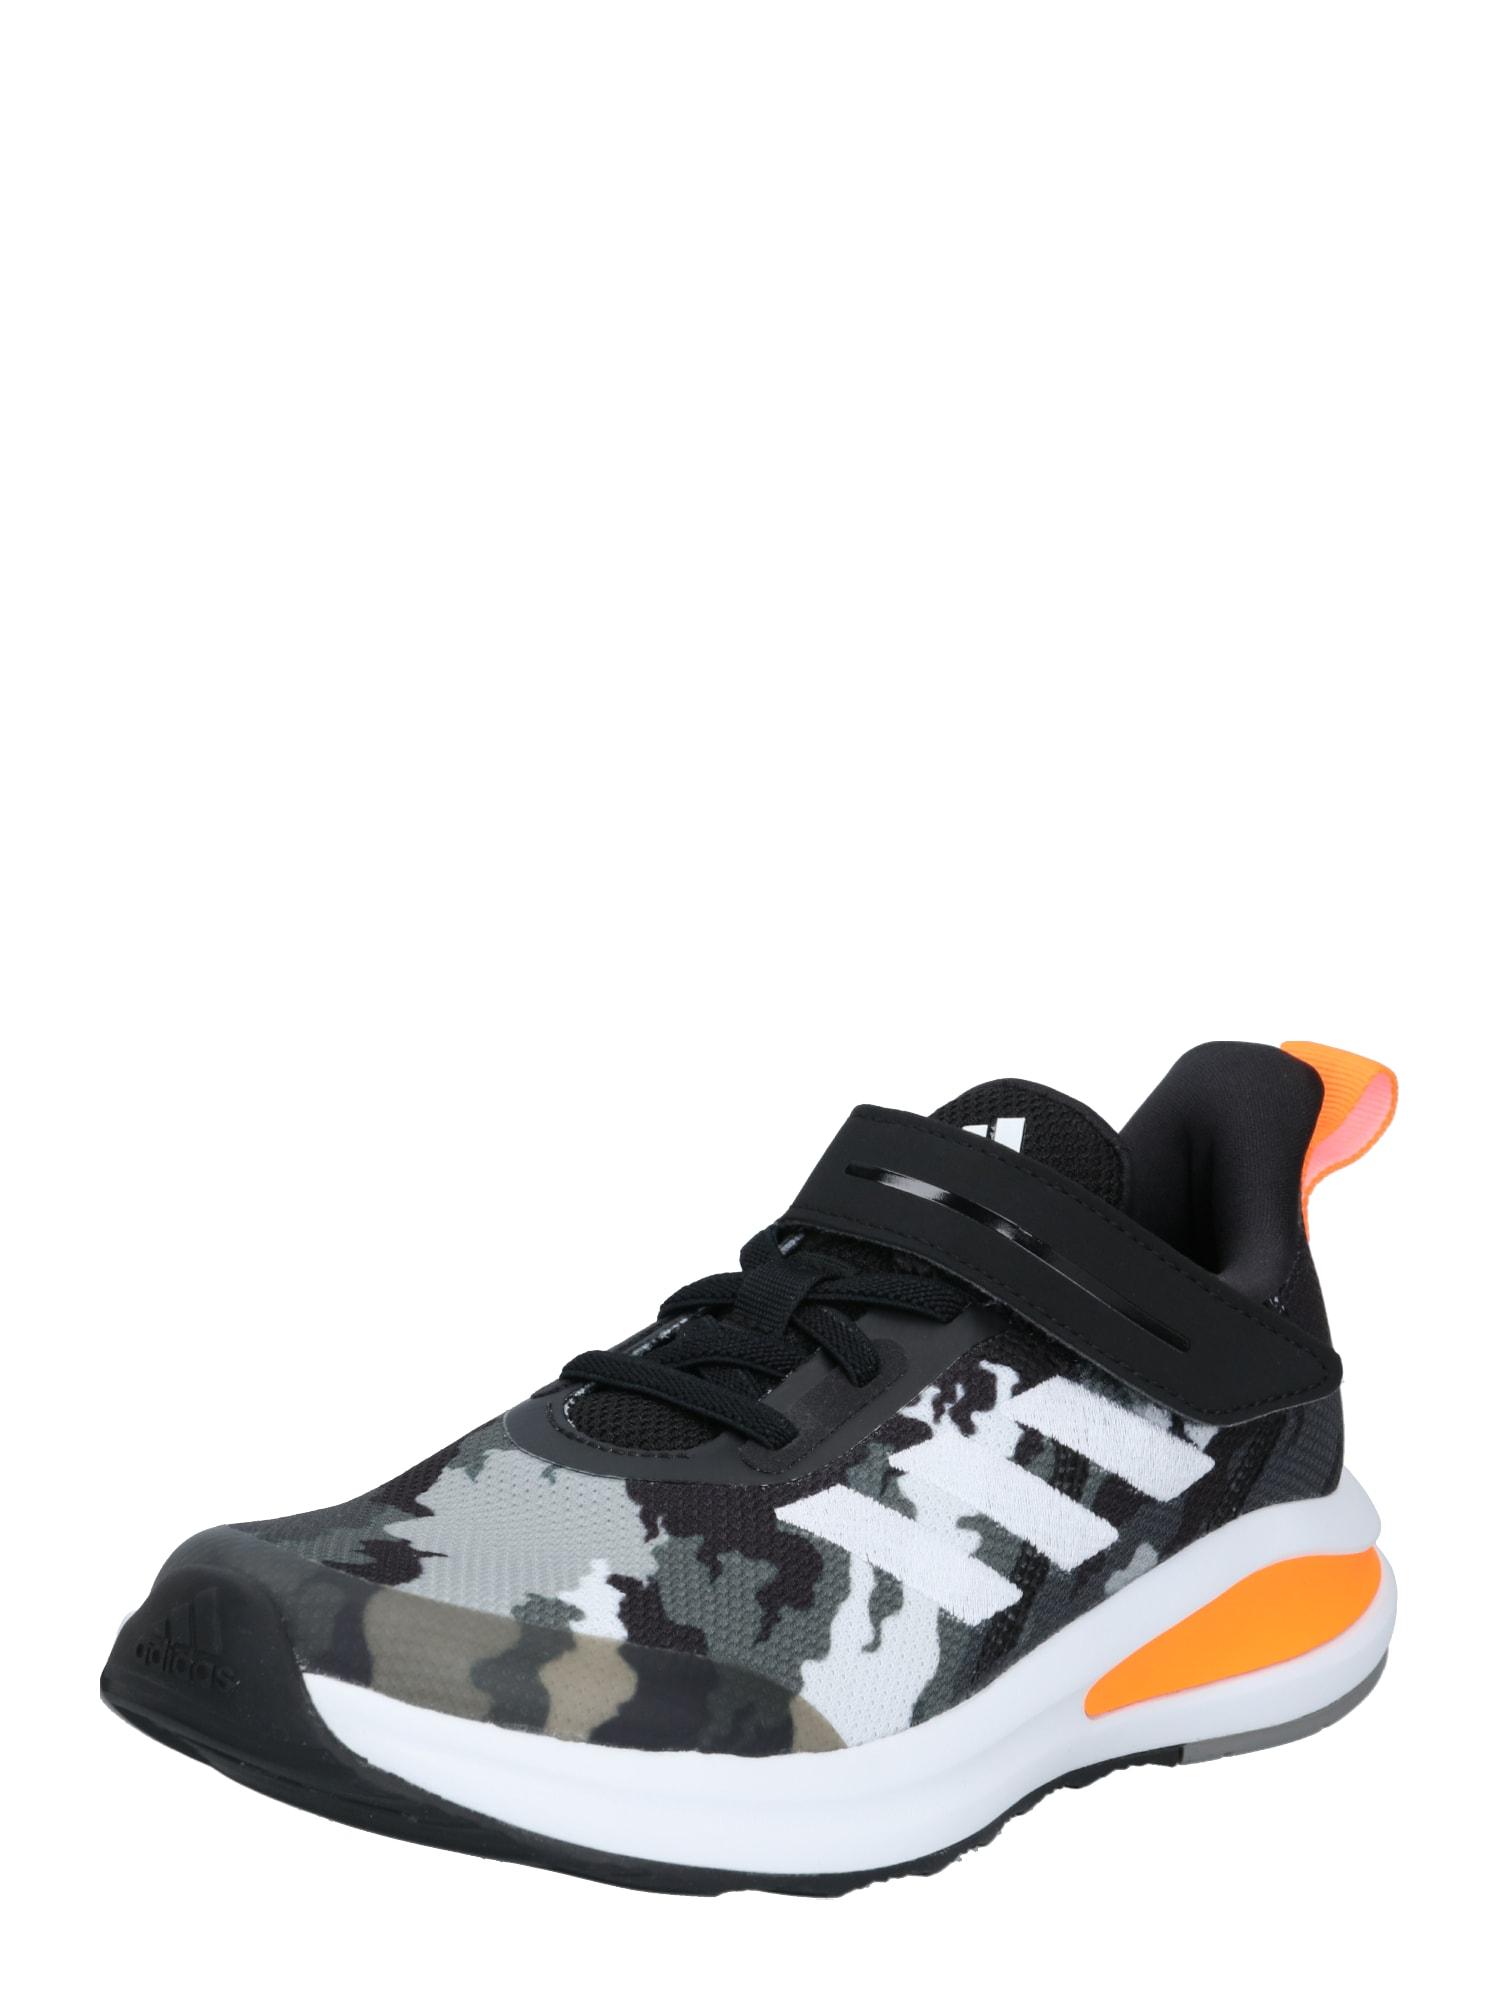 ADIDAS PERFORMANCE Sportovní boty  šedá / černá / bílá